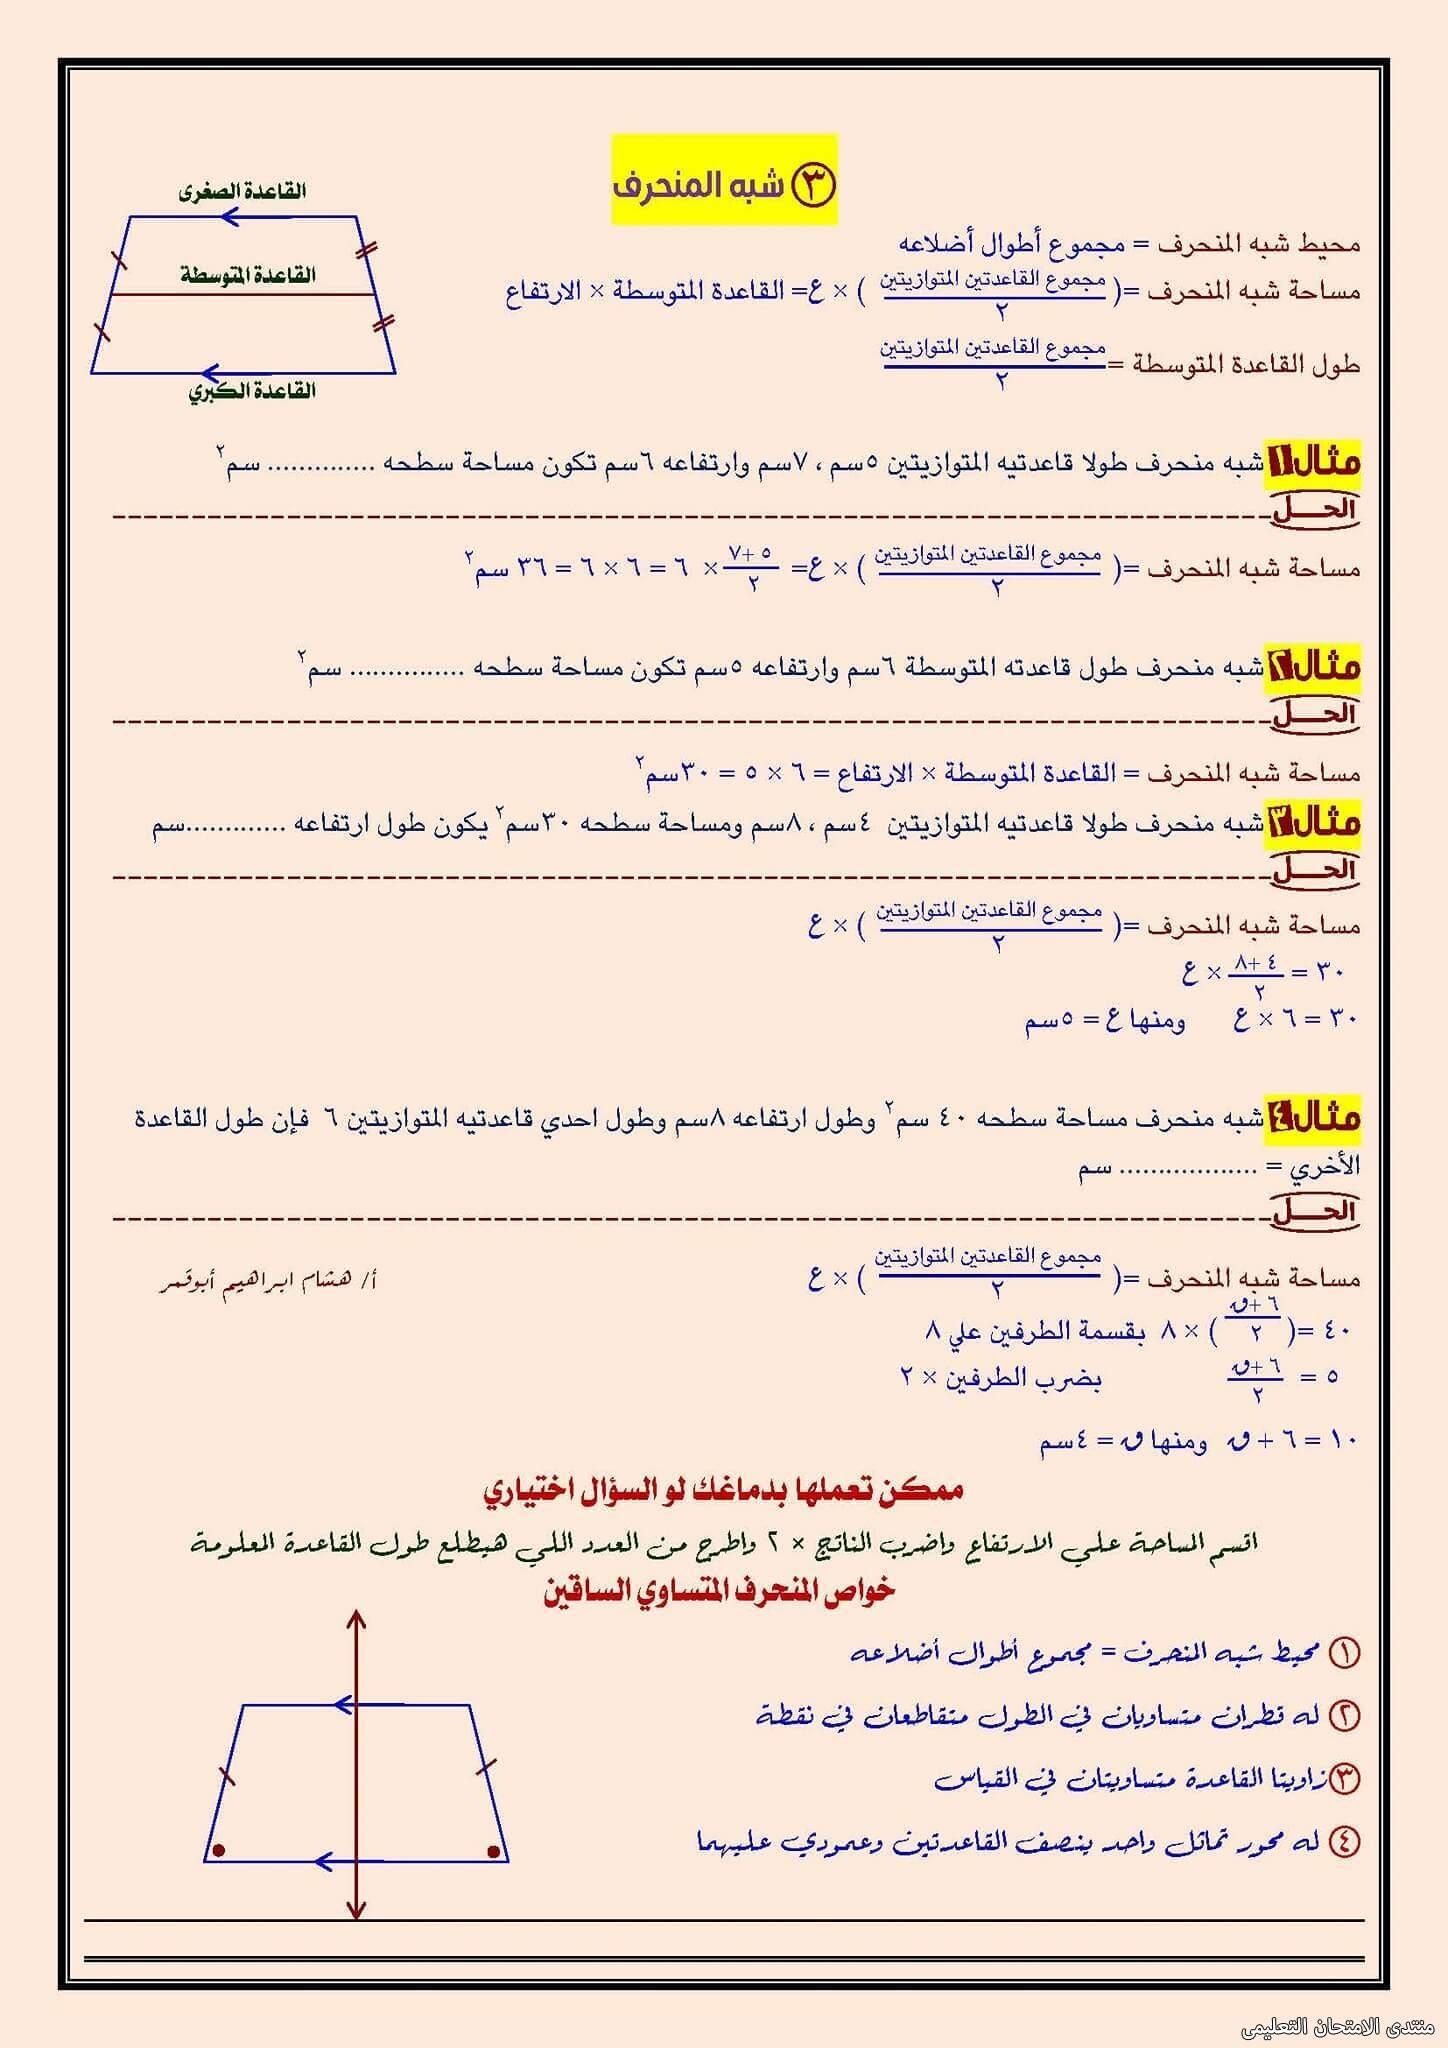 exam-eg.com_16181641947973.jpg